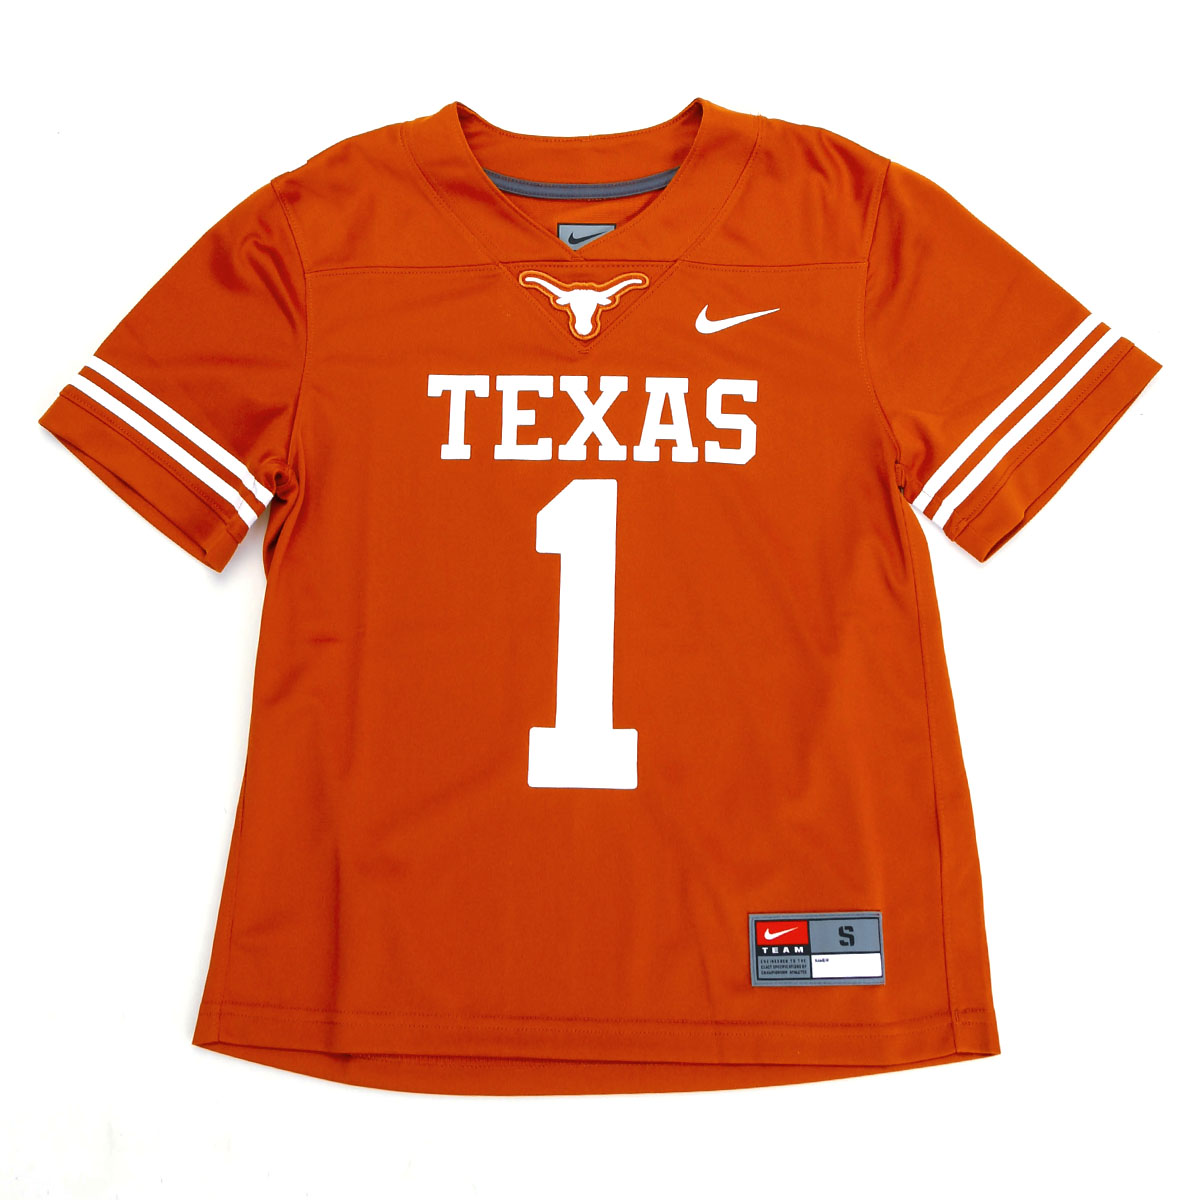 Texas Longhorn Youth #1 Football Jersey